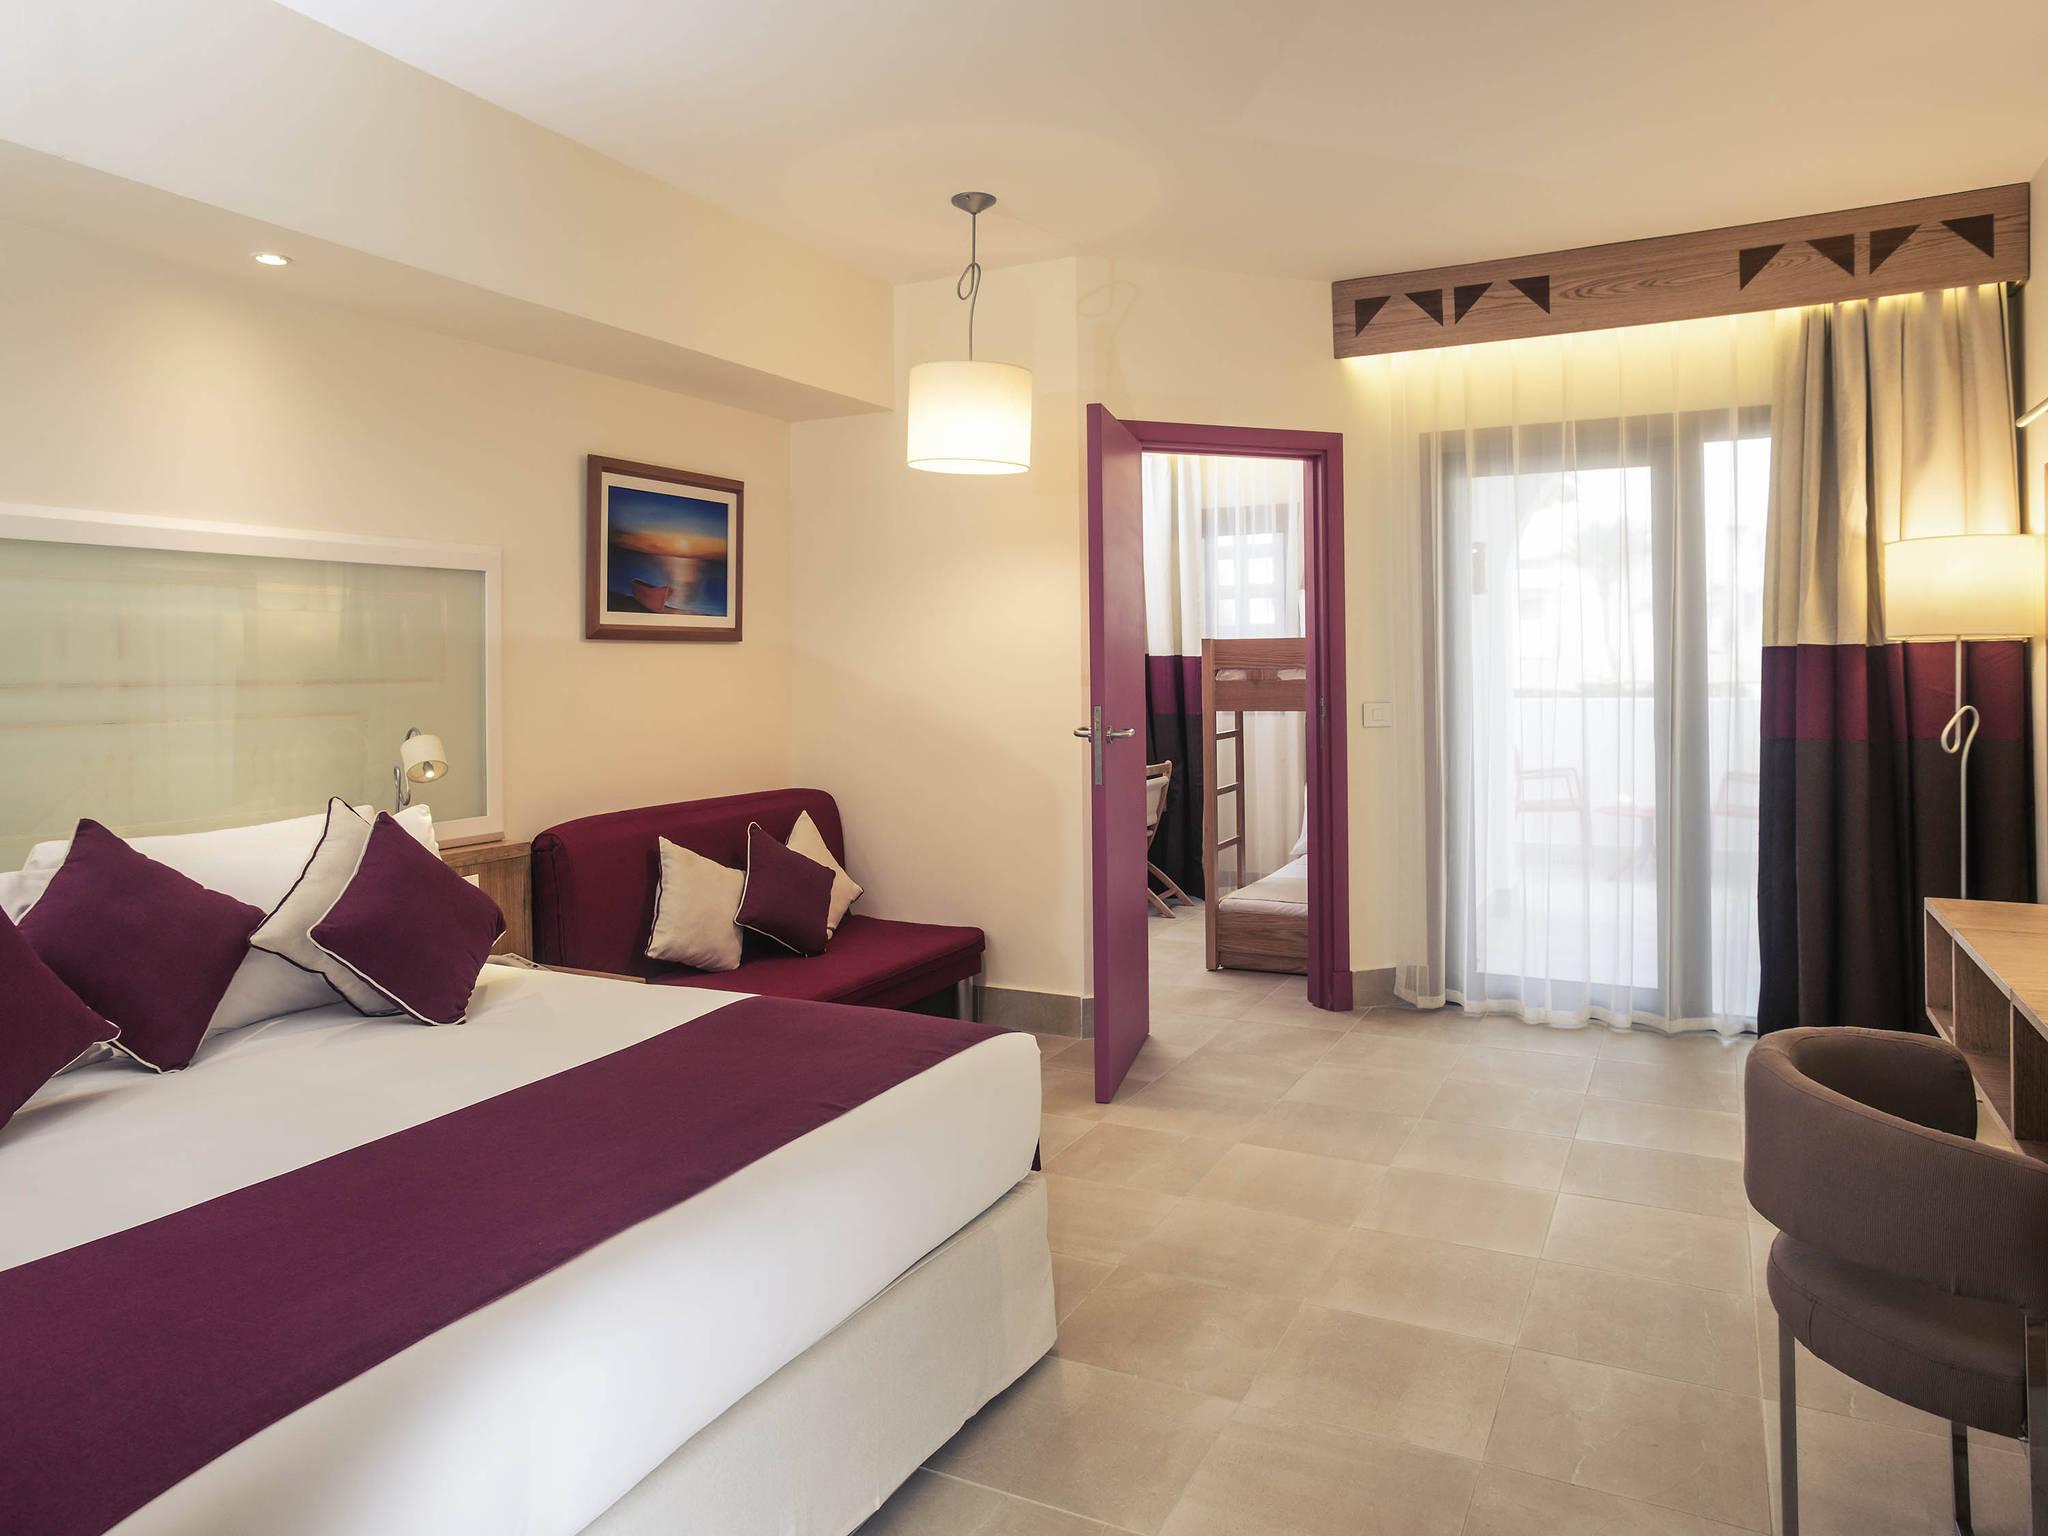 All Inclusive Hotel in HURGHADA Mercure Hurghada Hotel